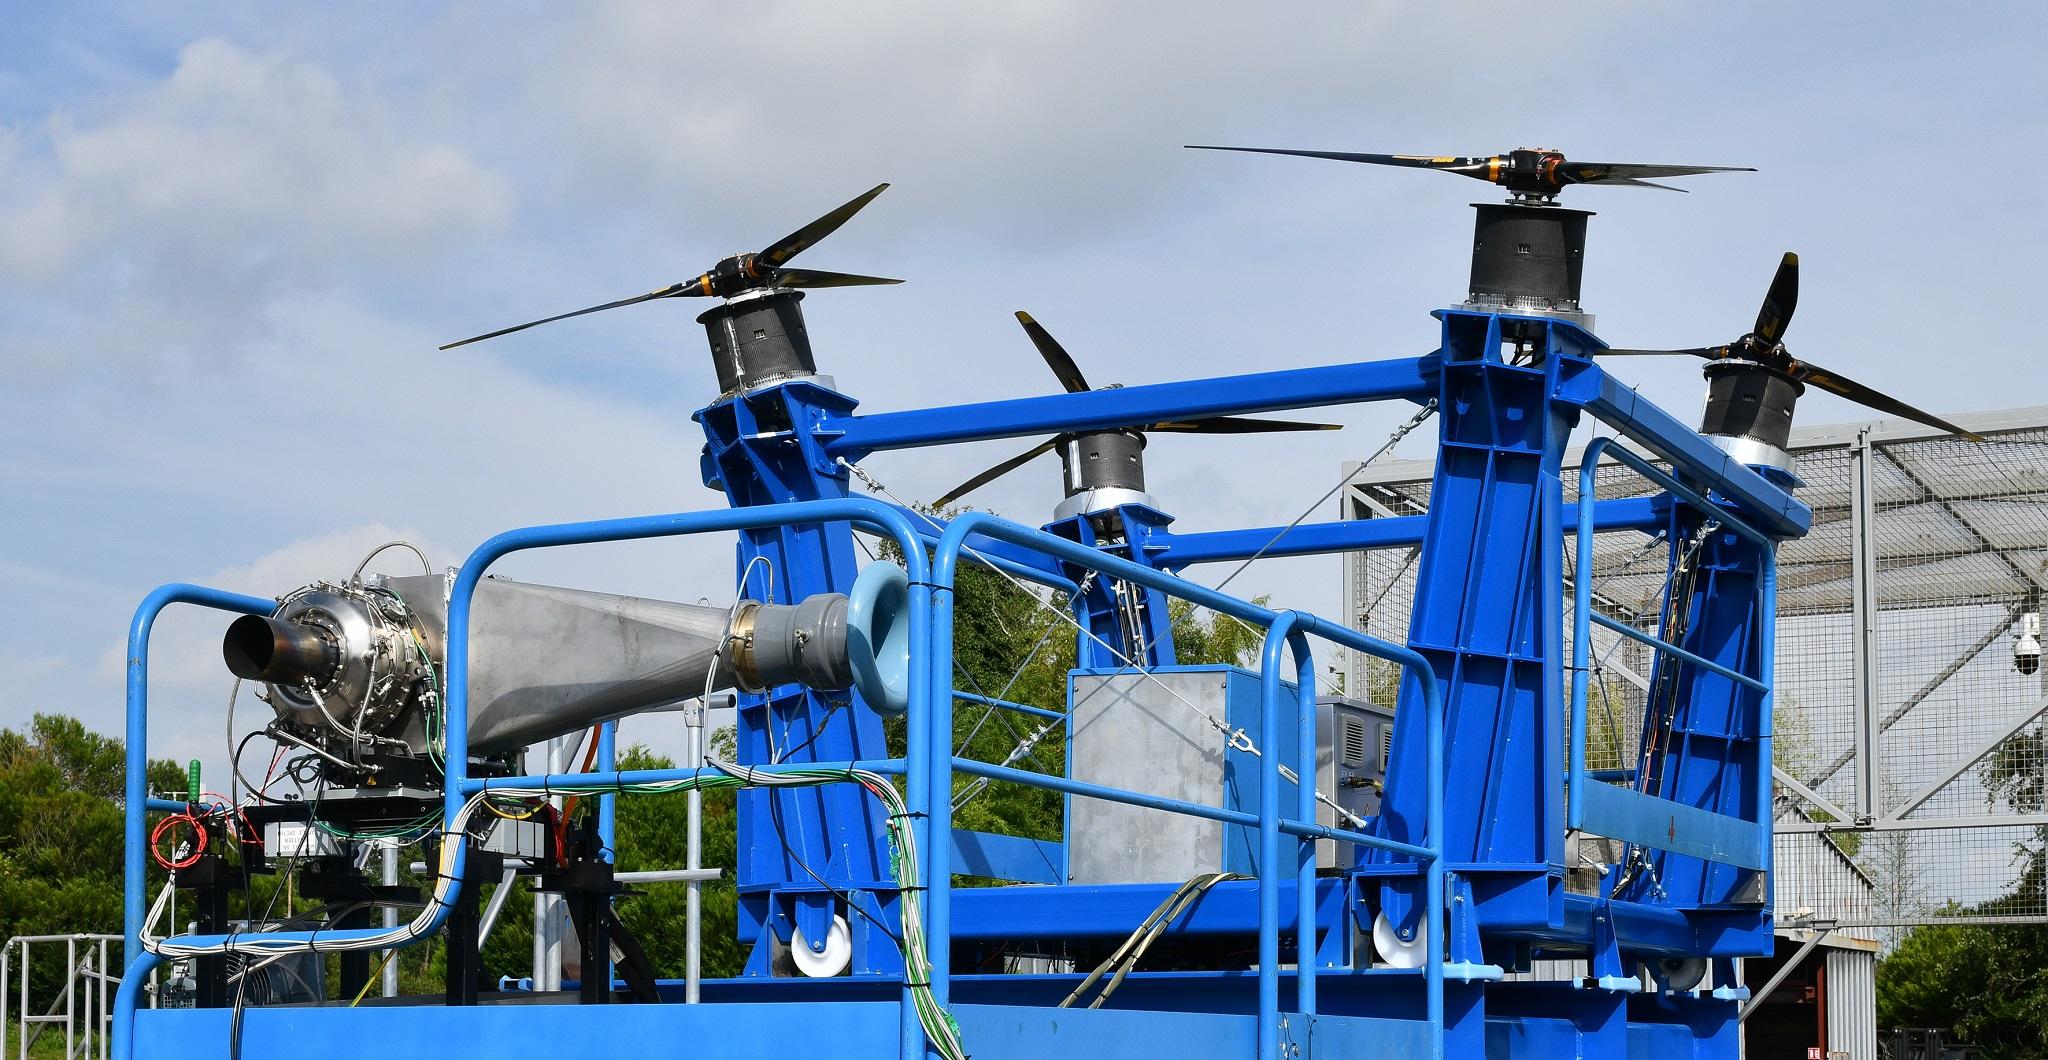 Safran hybrid electric power system